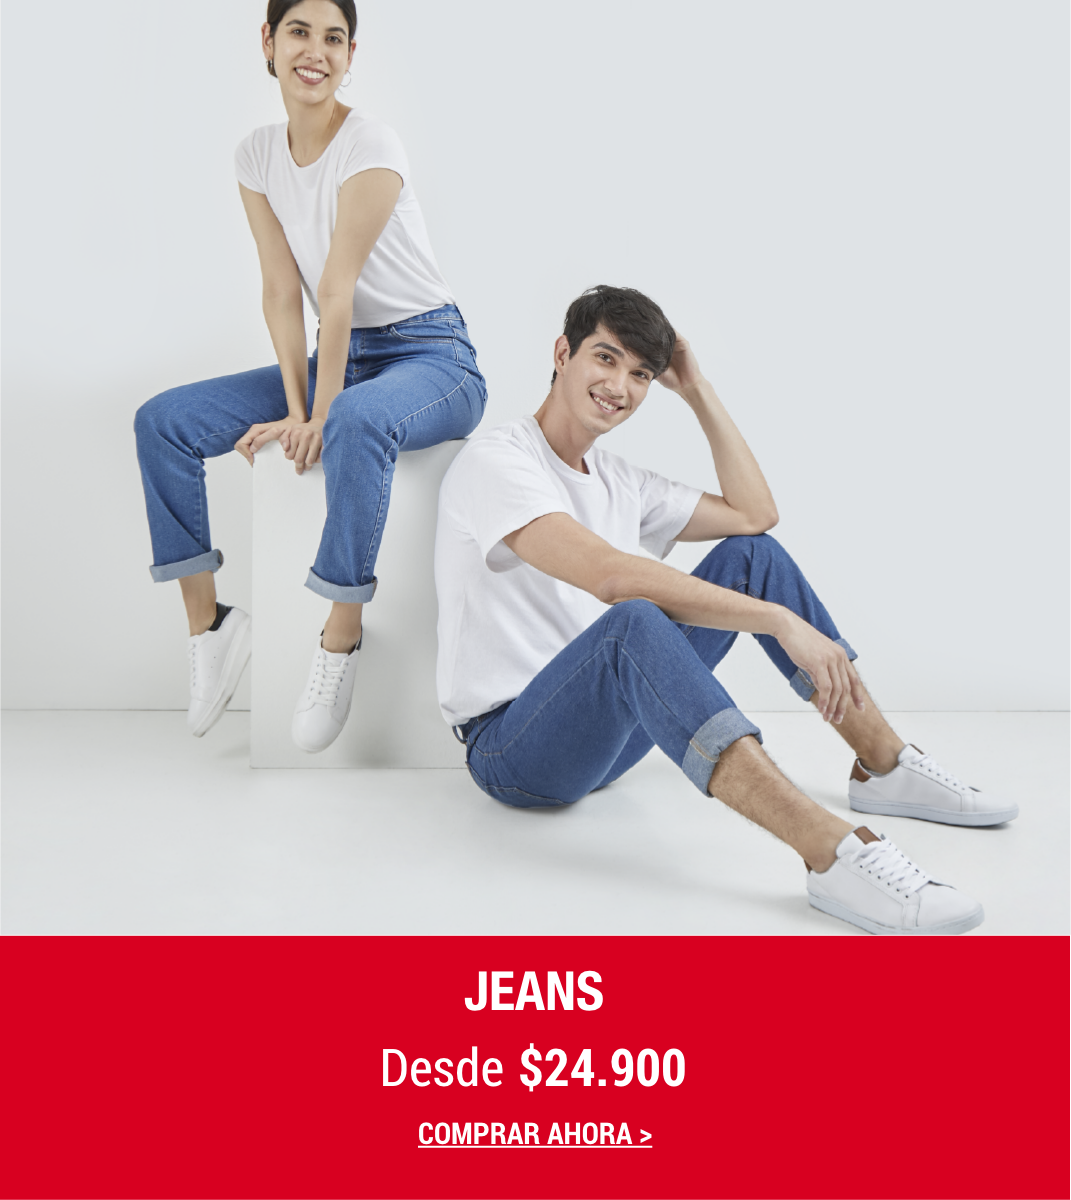 Banner Home - ENE2021 - Mixto-Jeans (Desktop)